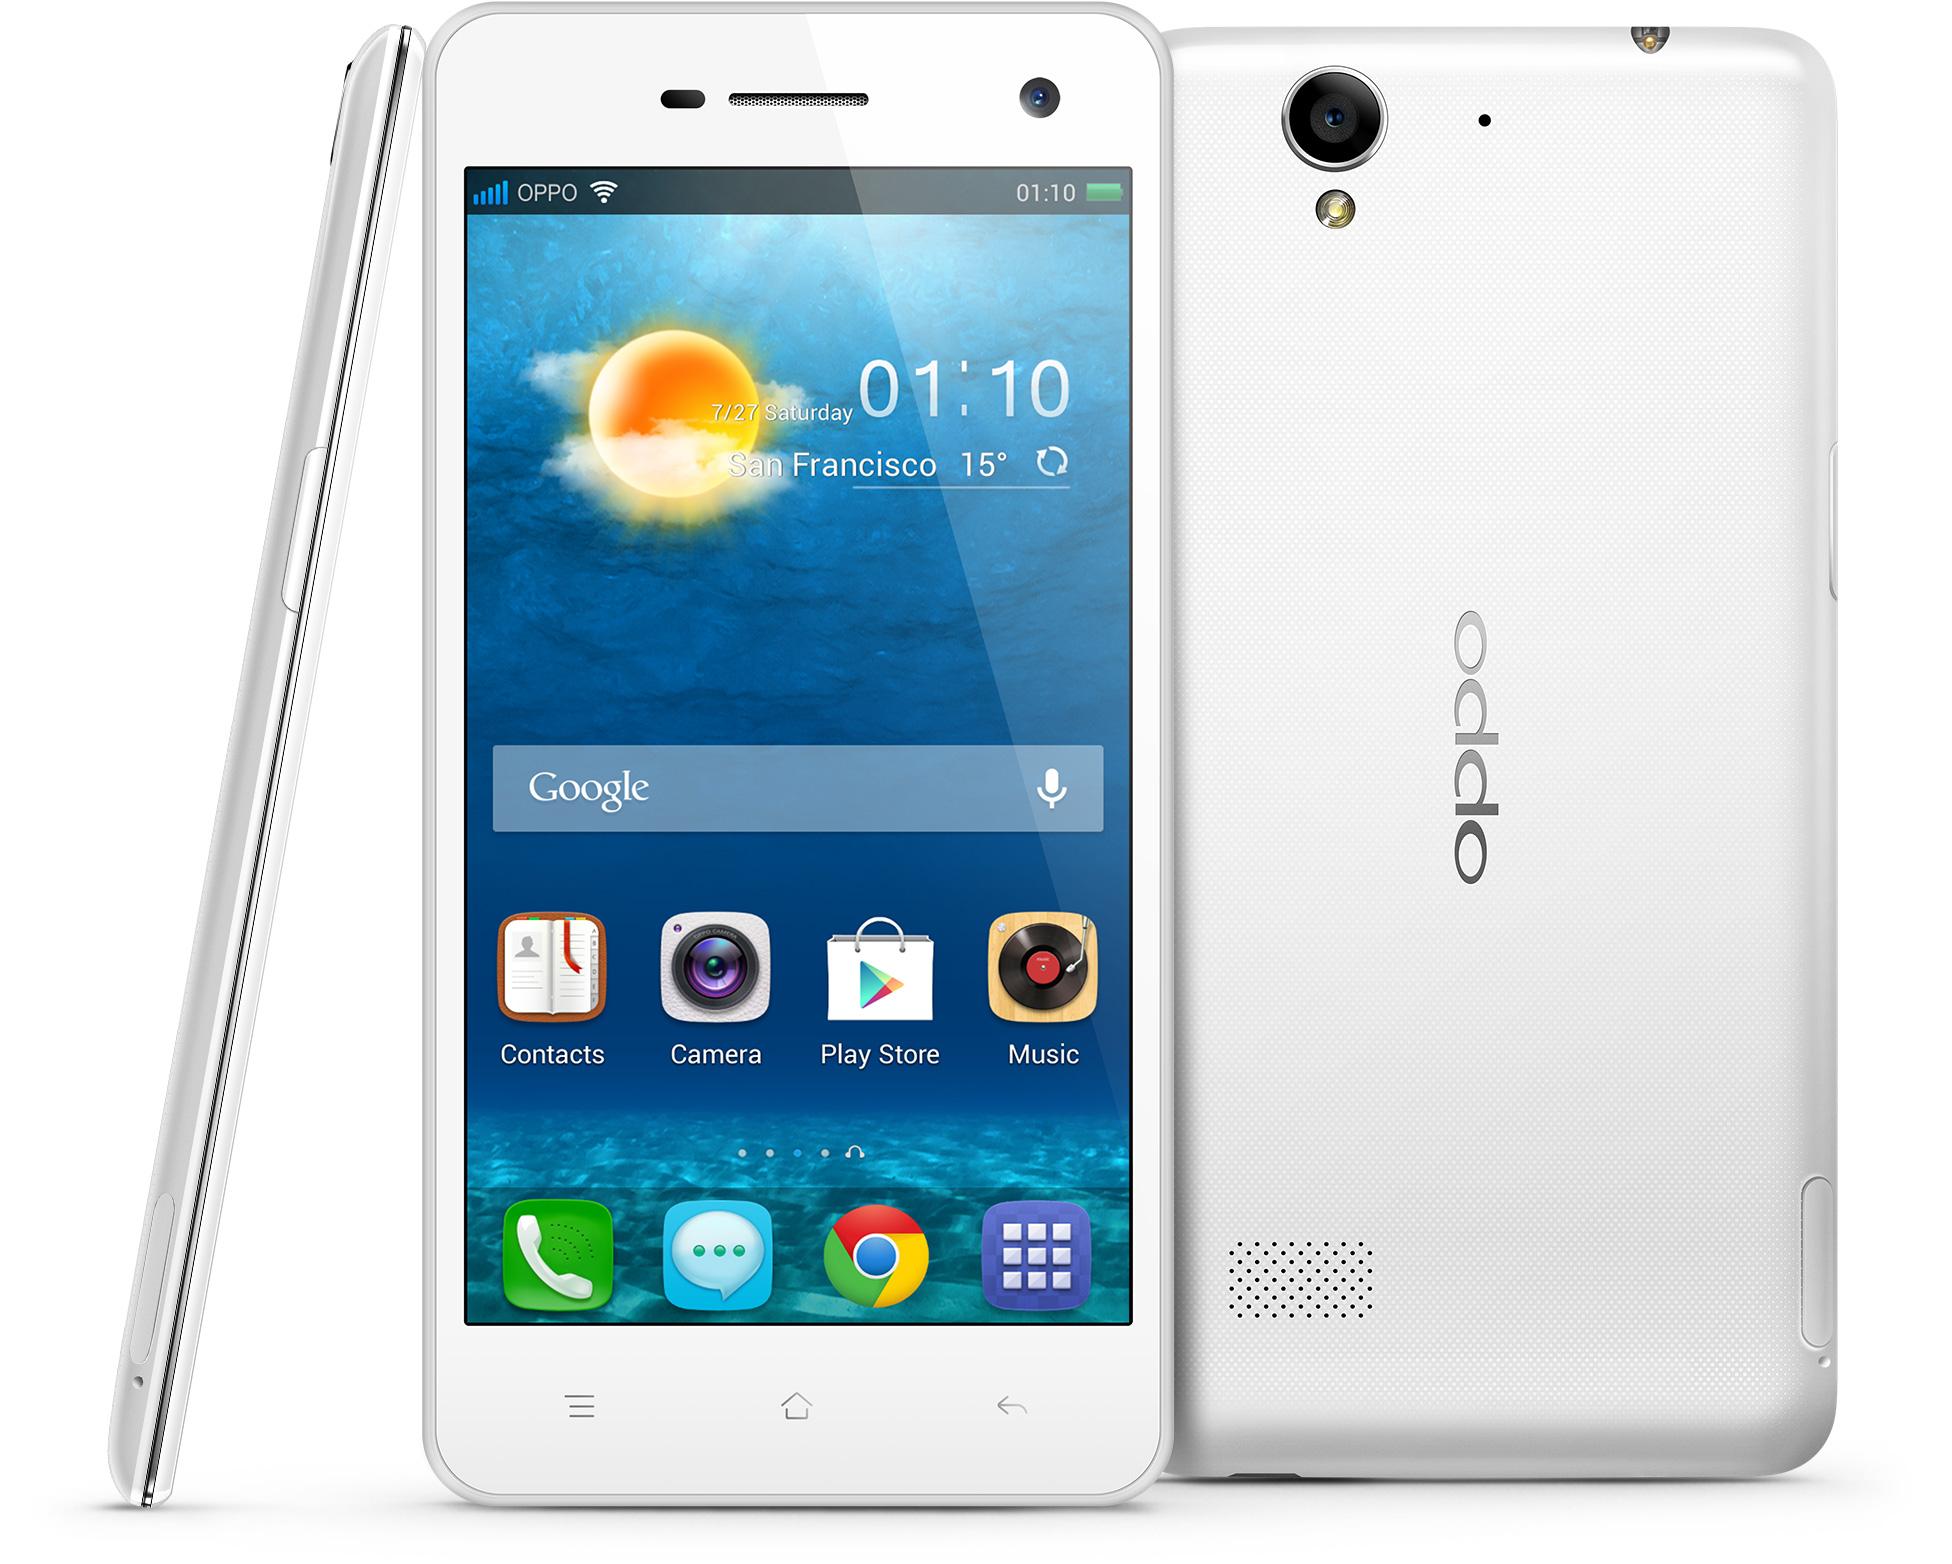 "Oppo R819 - smartphone z 4,7"" ekranem, Android 4.2 i Dual SIM"